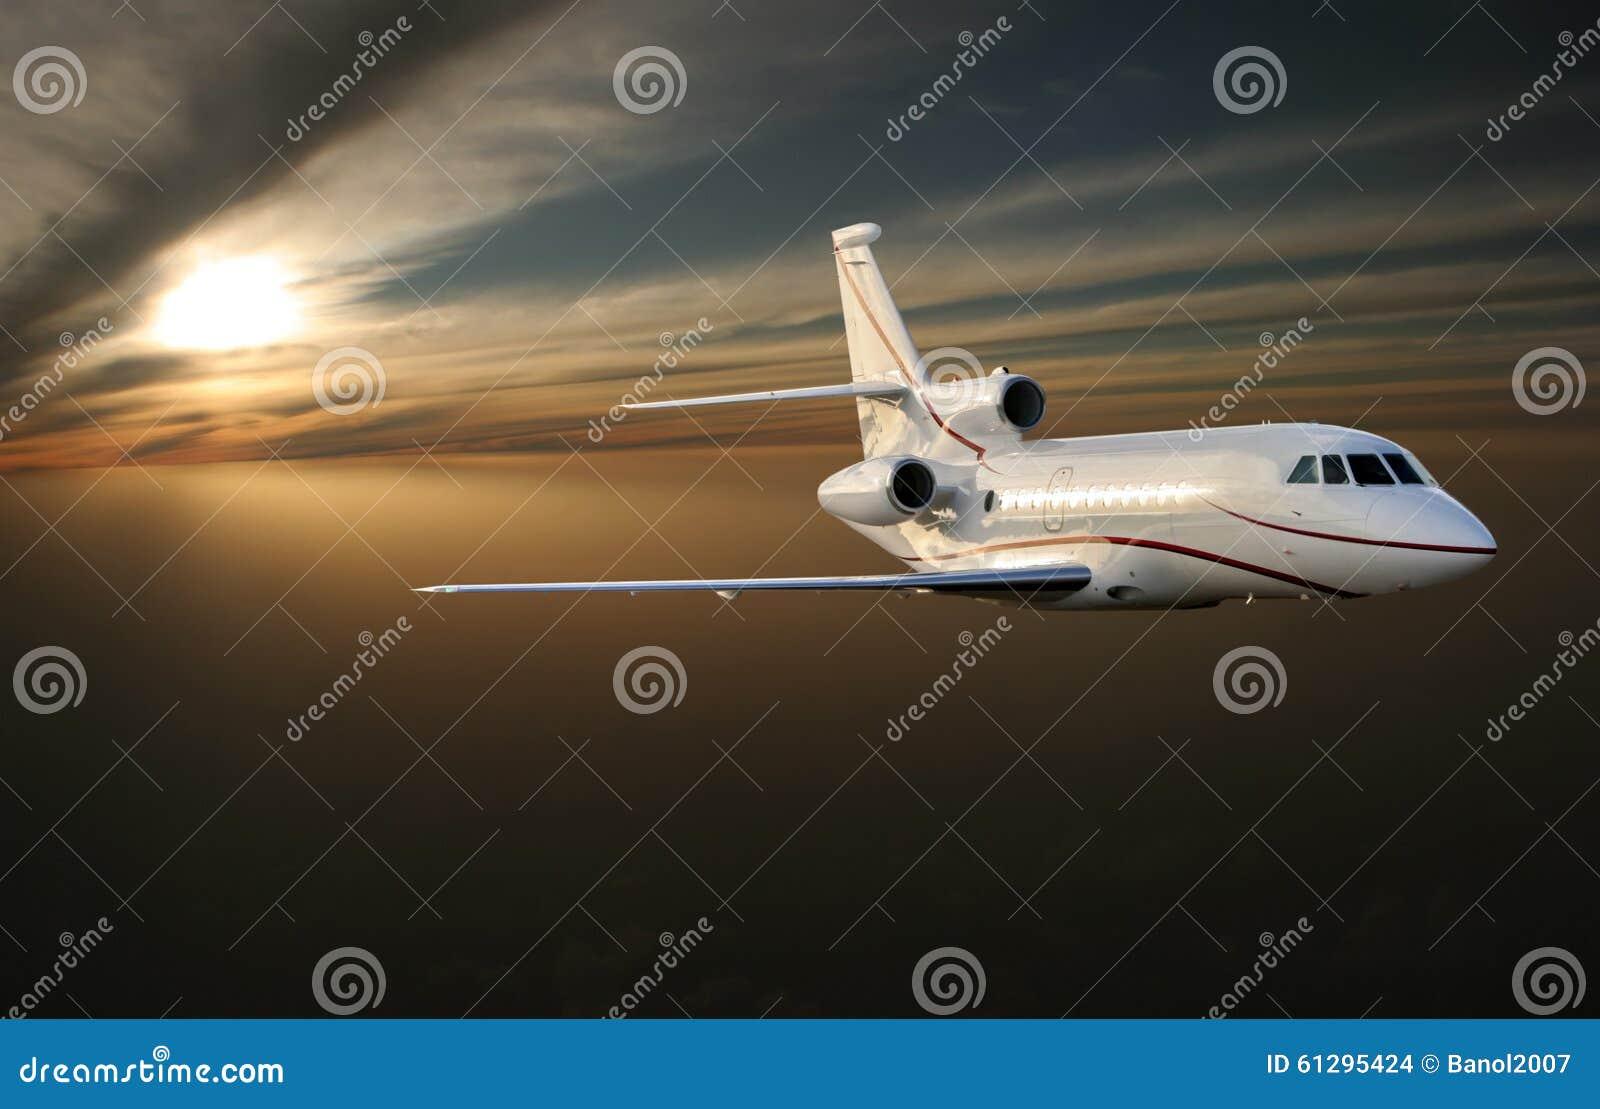 Мorning flight. Luxury jet plane above Earth.